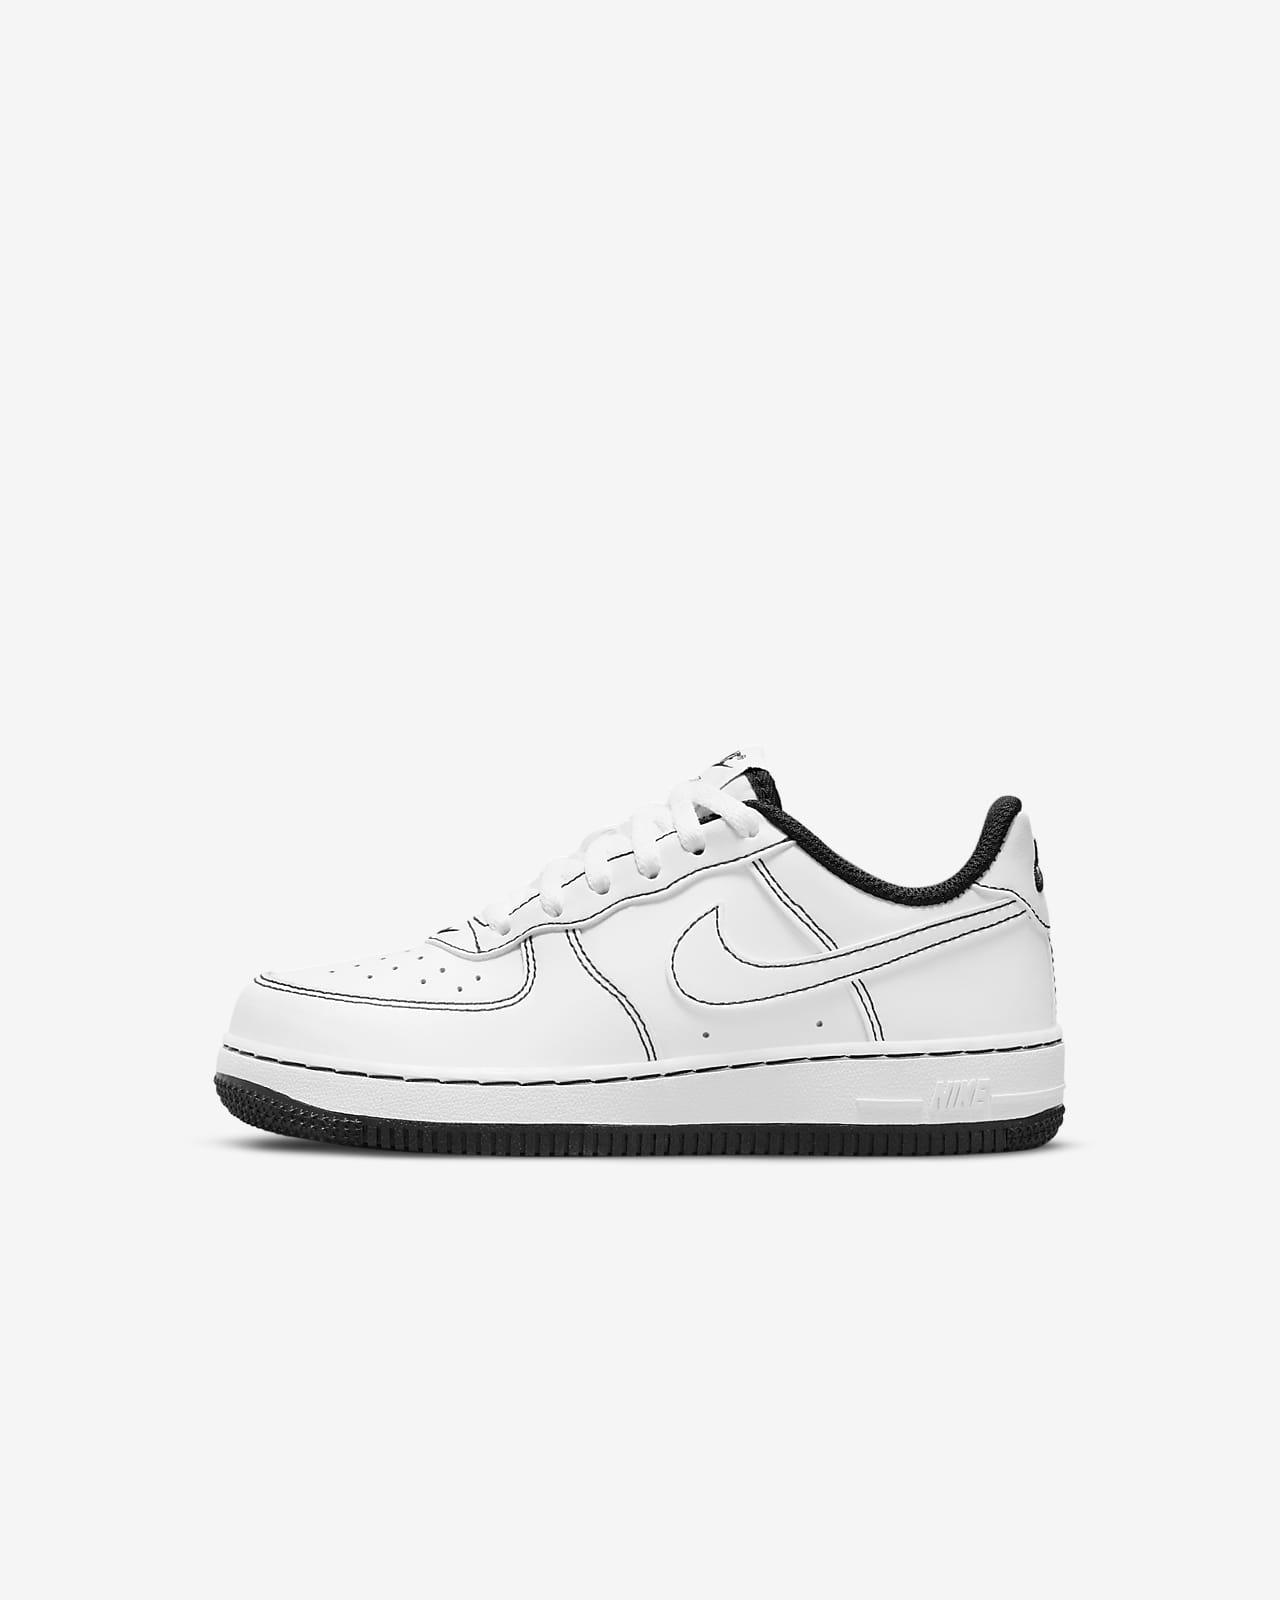 Calzado para niños talla pequeña Nike Air Force 1